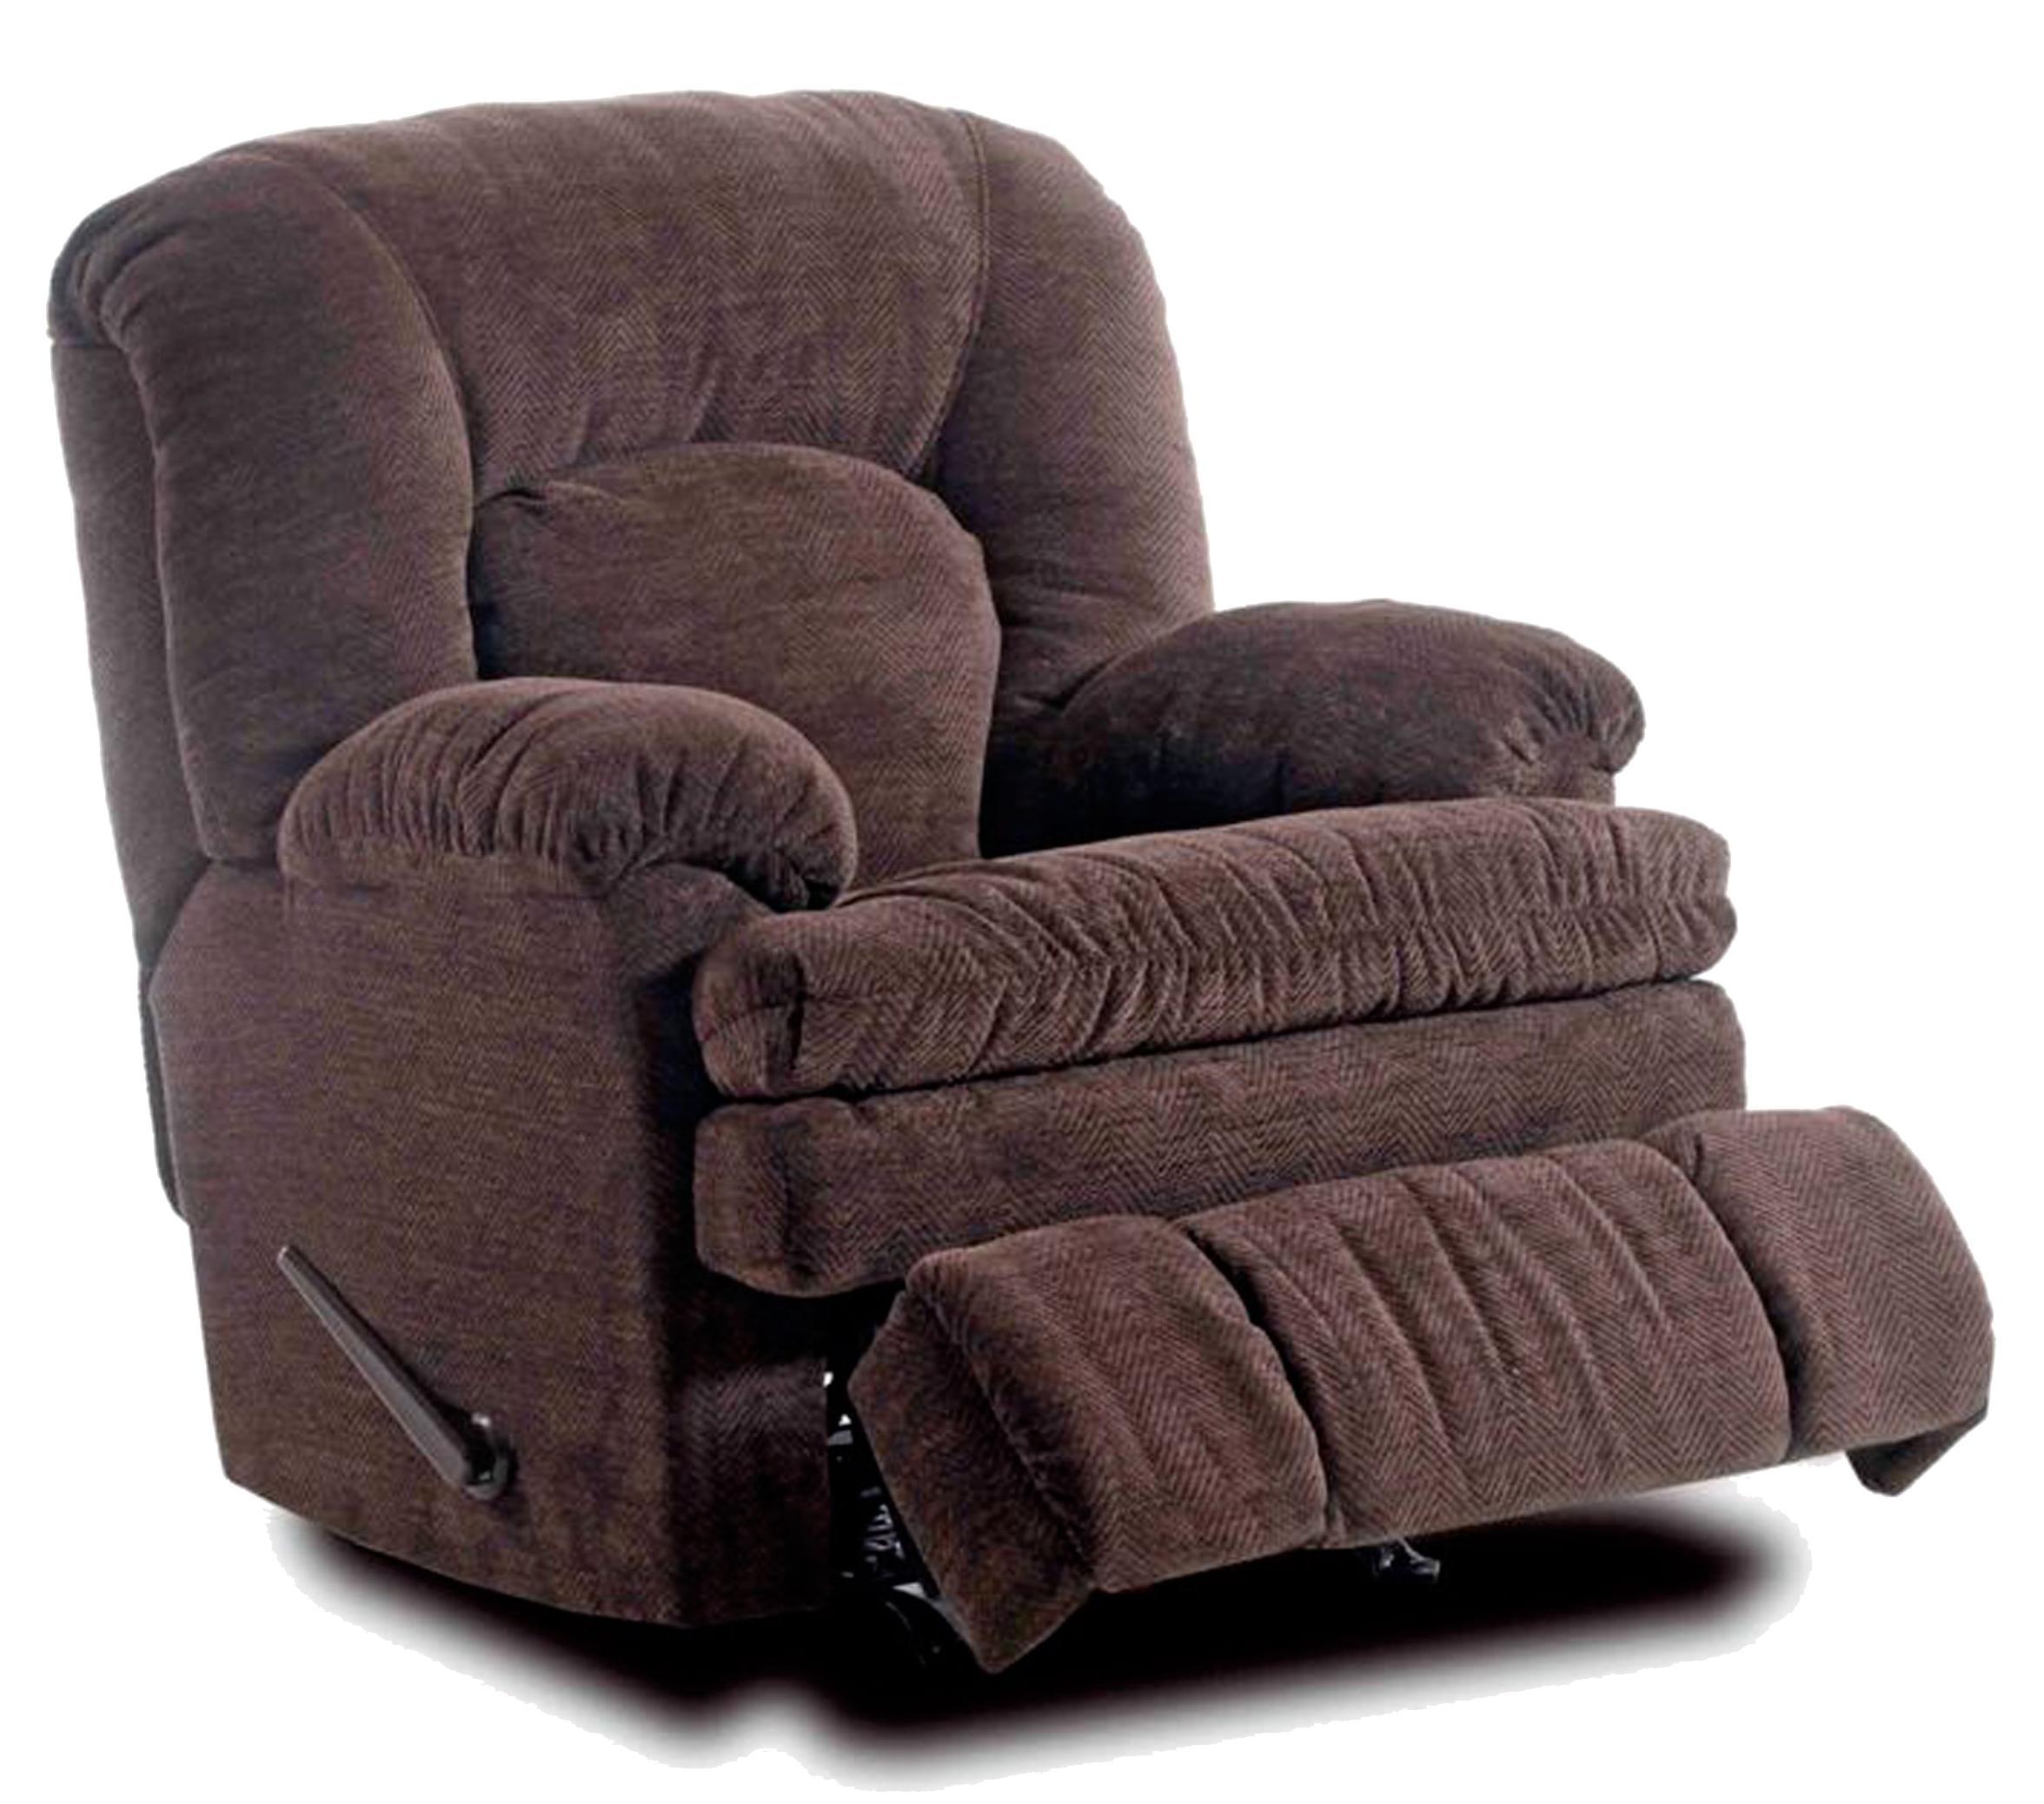 Comfort Living Grandover Rocker Recliner - Item Number: 103-91-22